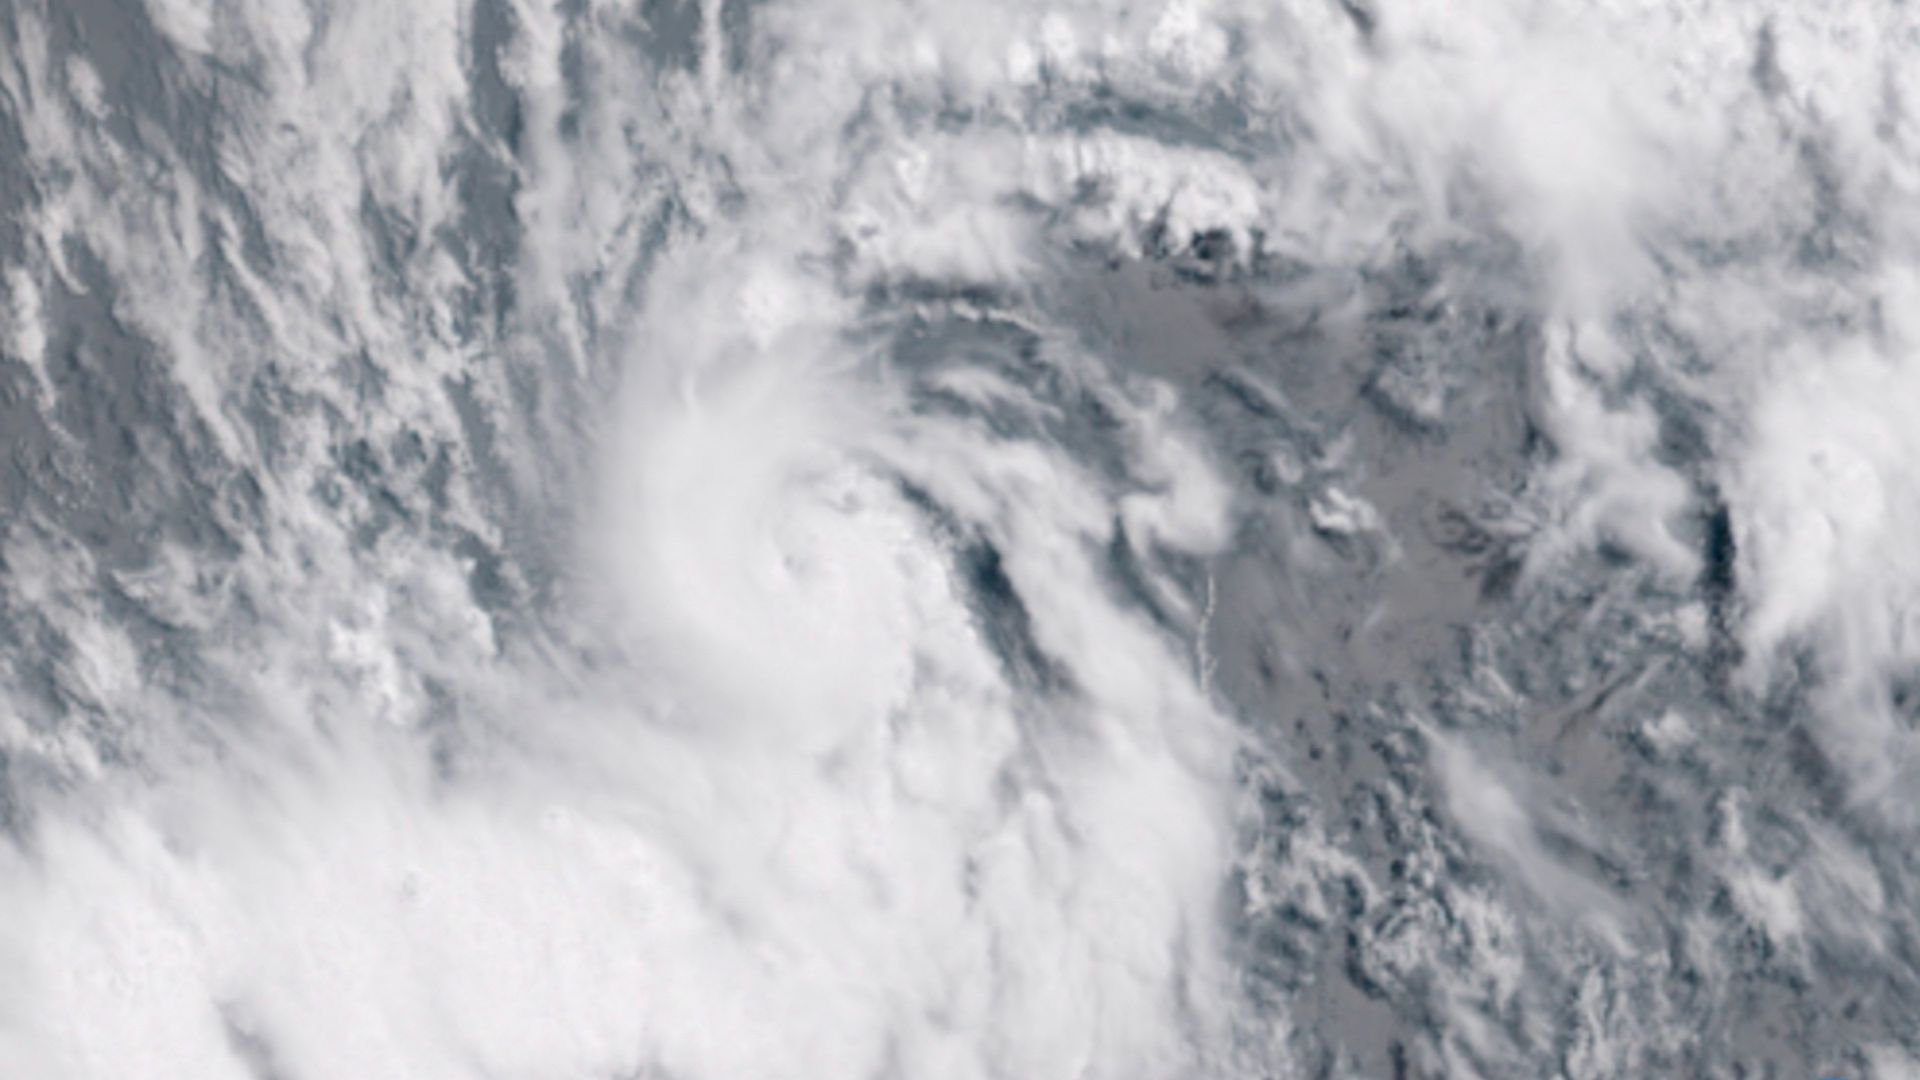 Satellite image showing tiny Hurricane Beryl in the Atlantic Ocean.